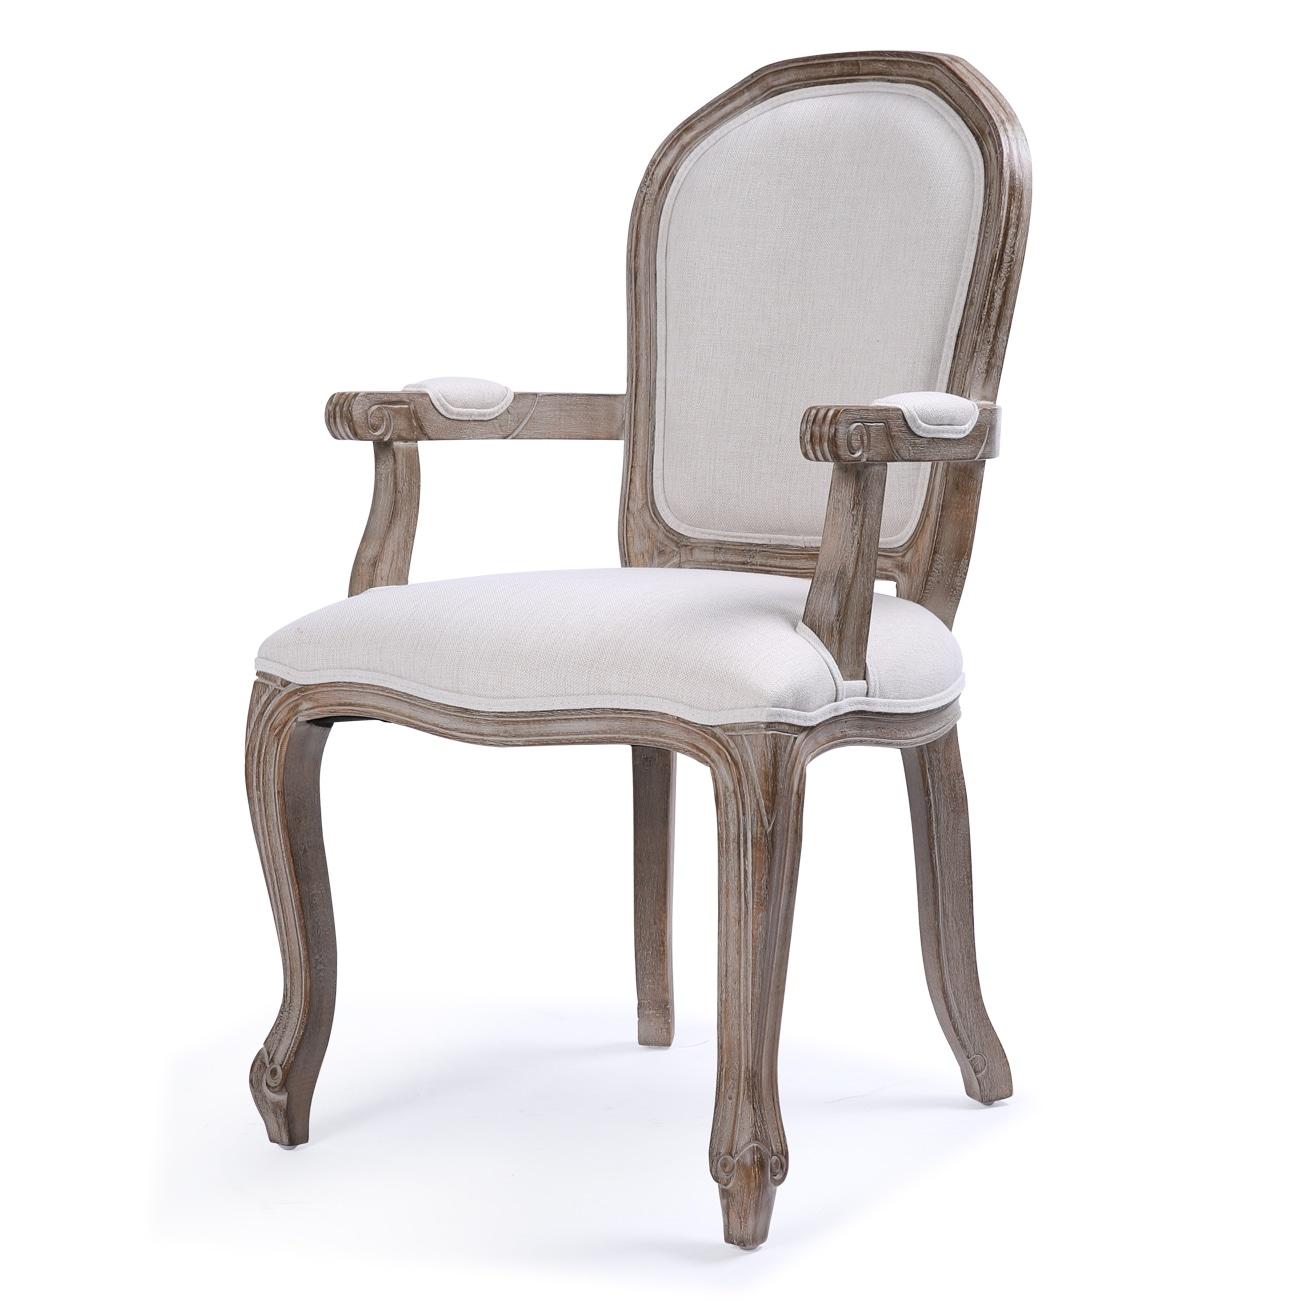 Belleze elegant upholstered modern linen high back formal dining chair w padded arm rest and wood legs beige